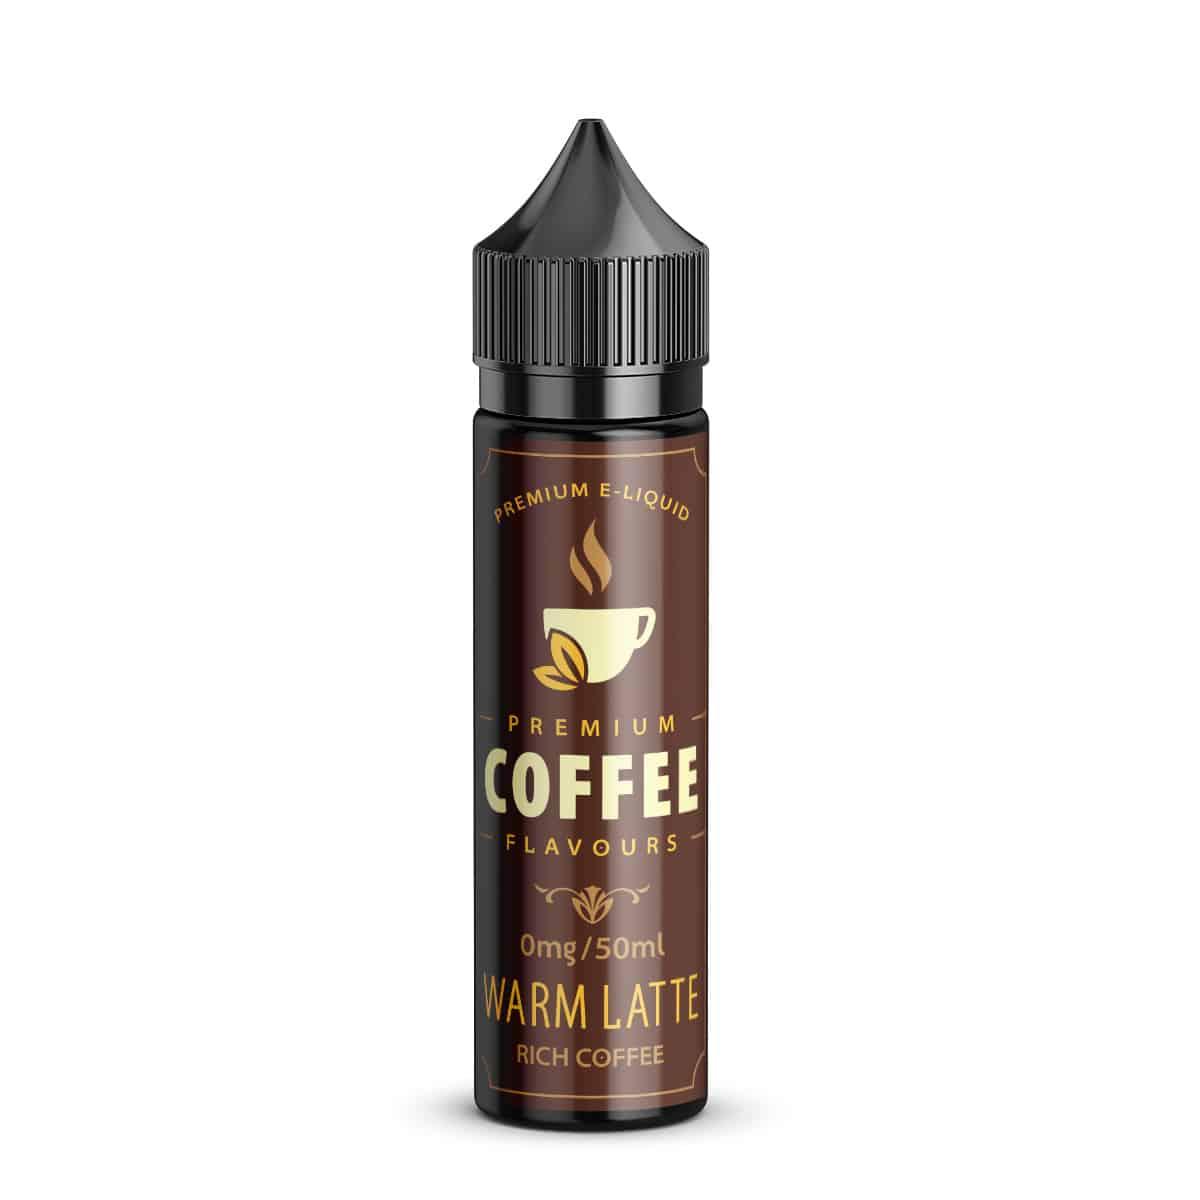 Premium Coffee - Warm Latte - 50ml